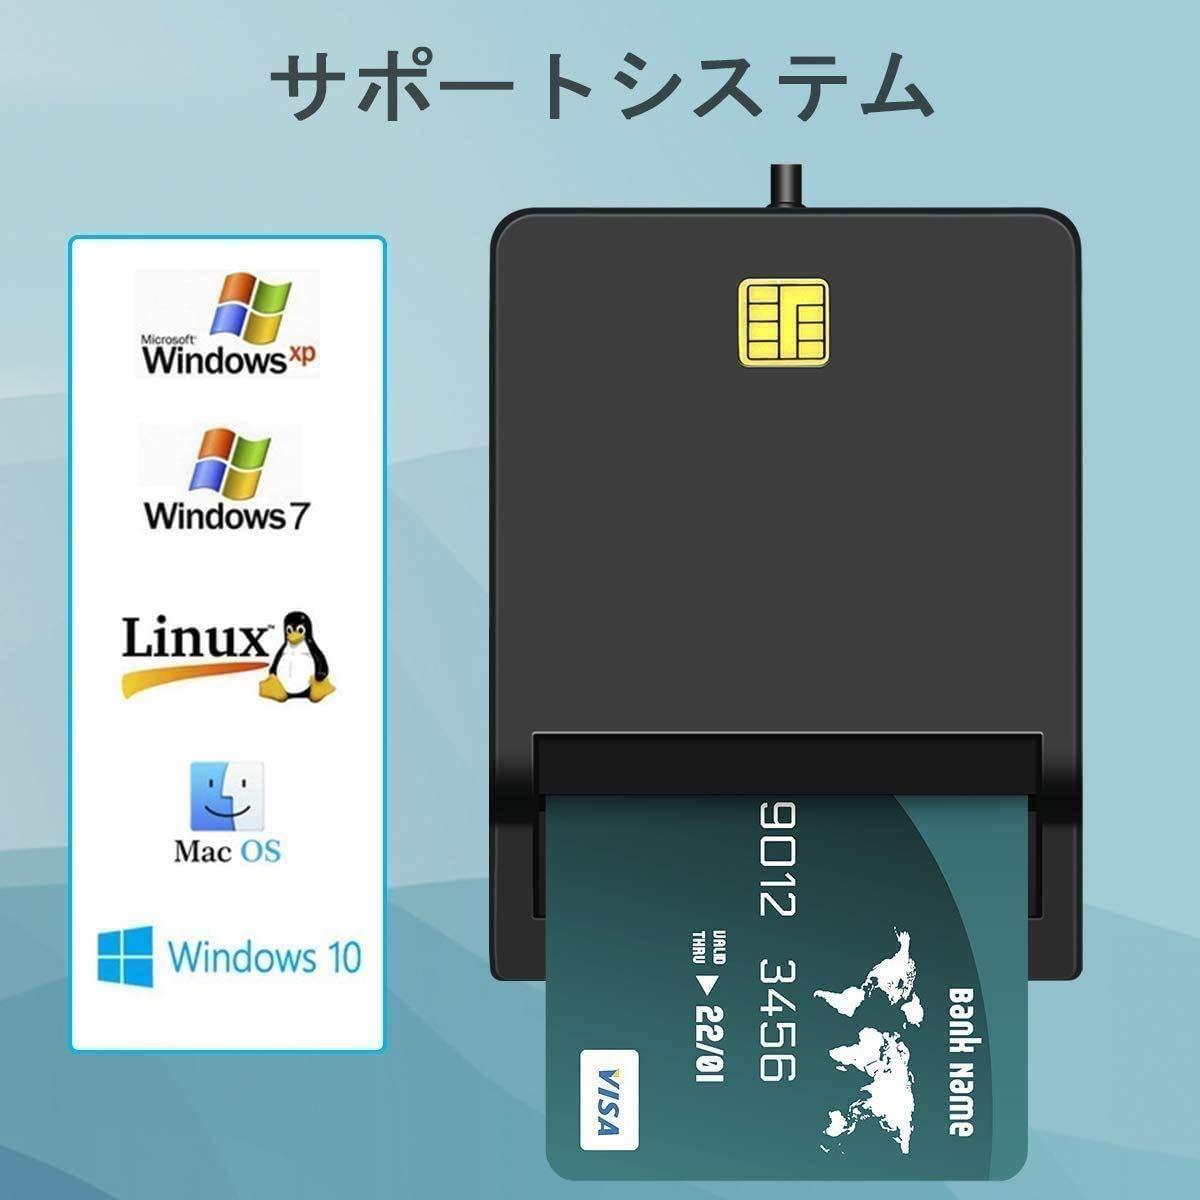 ICカードリーダーライタ接触型USB接続ICチップのついた住民基本台帳カード国税電子申告納税システム納税(e-Tax)地方税電子